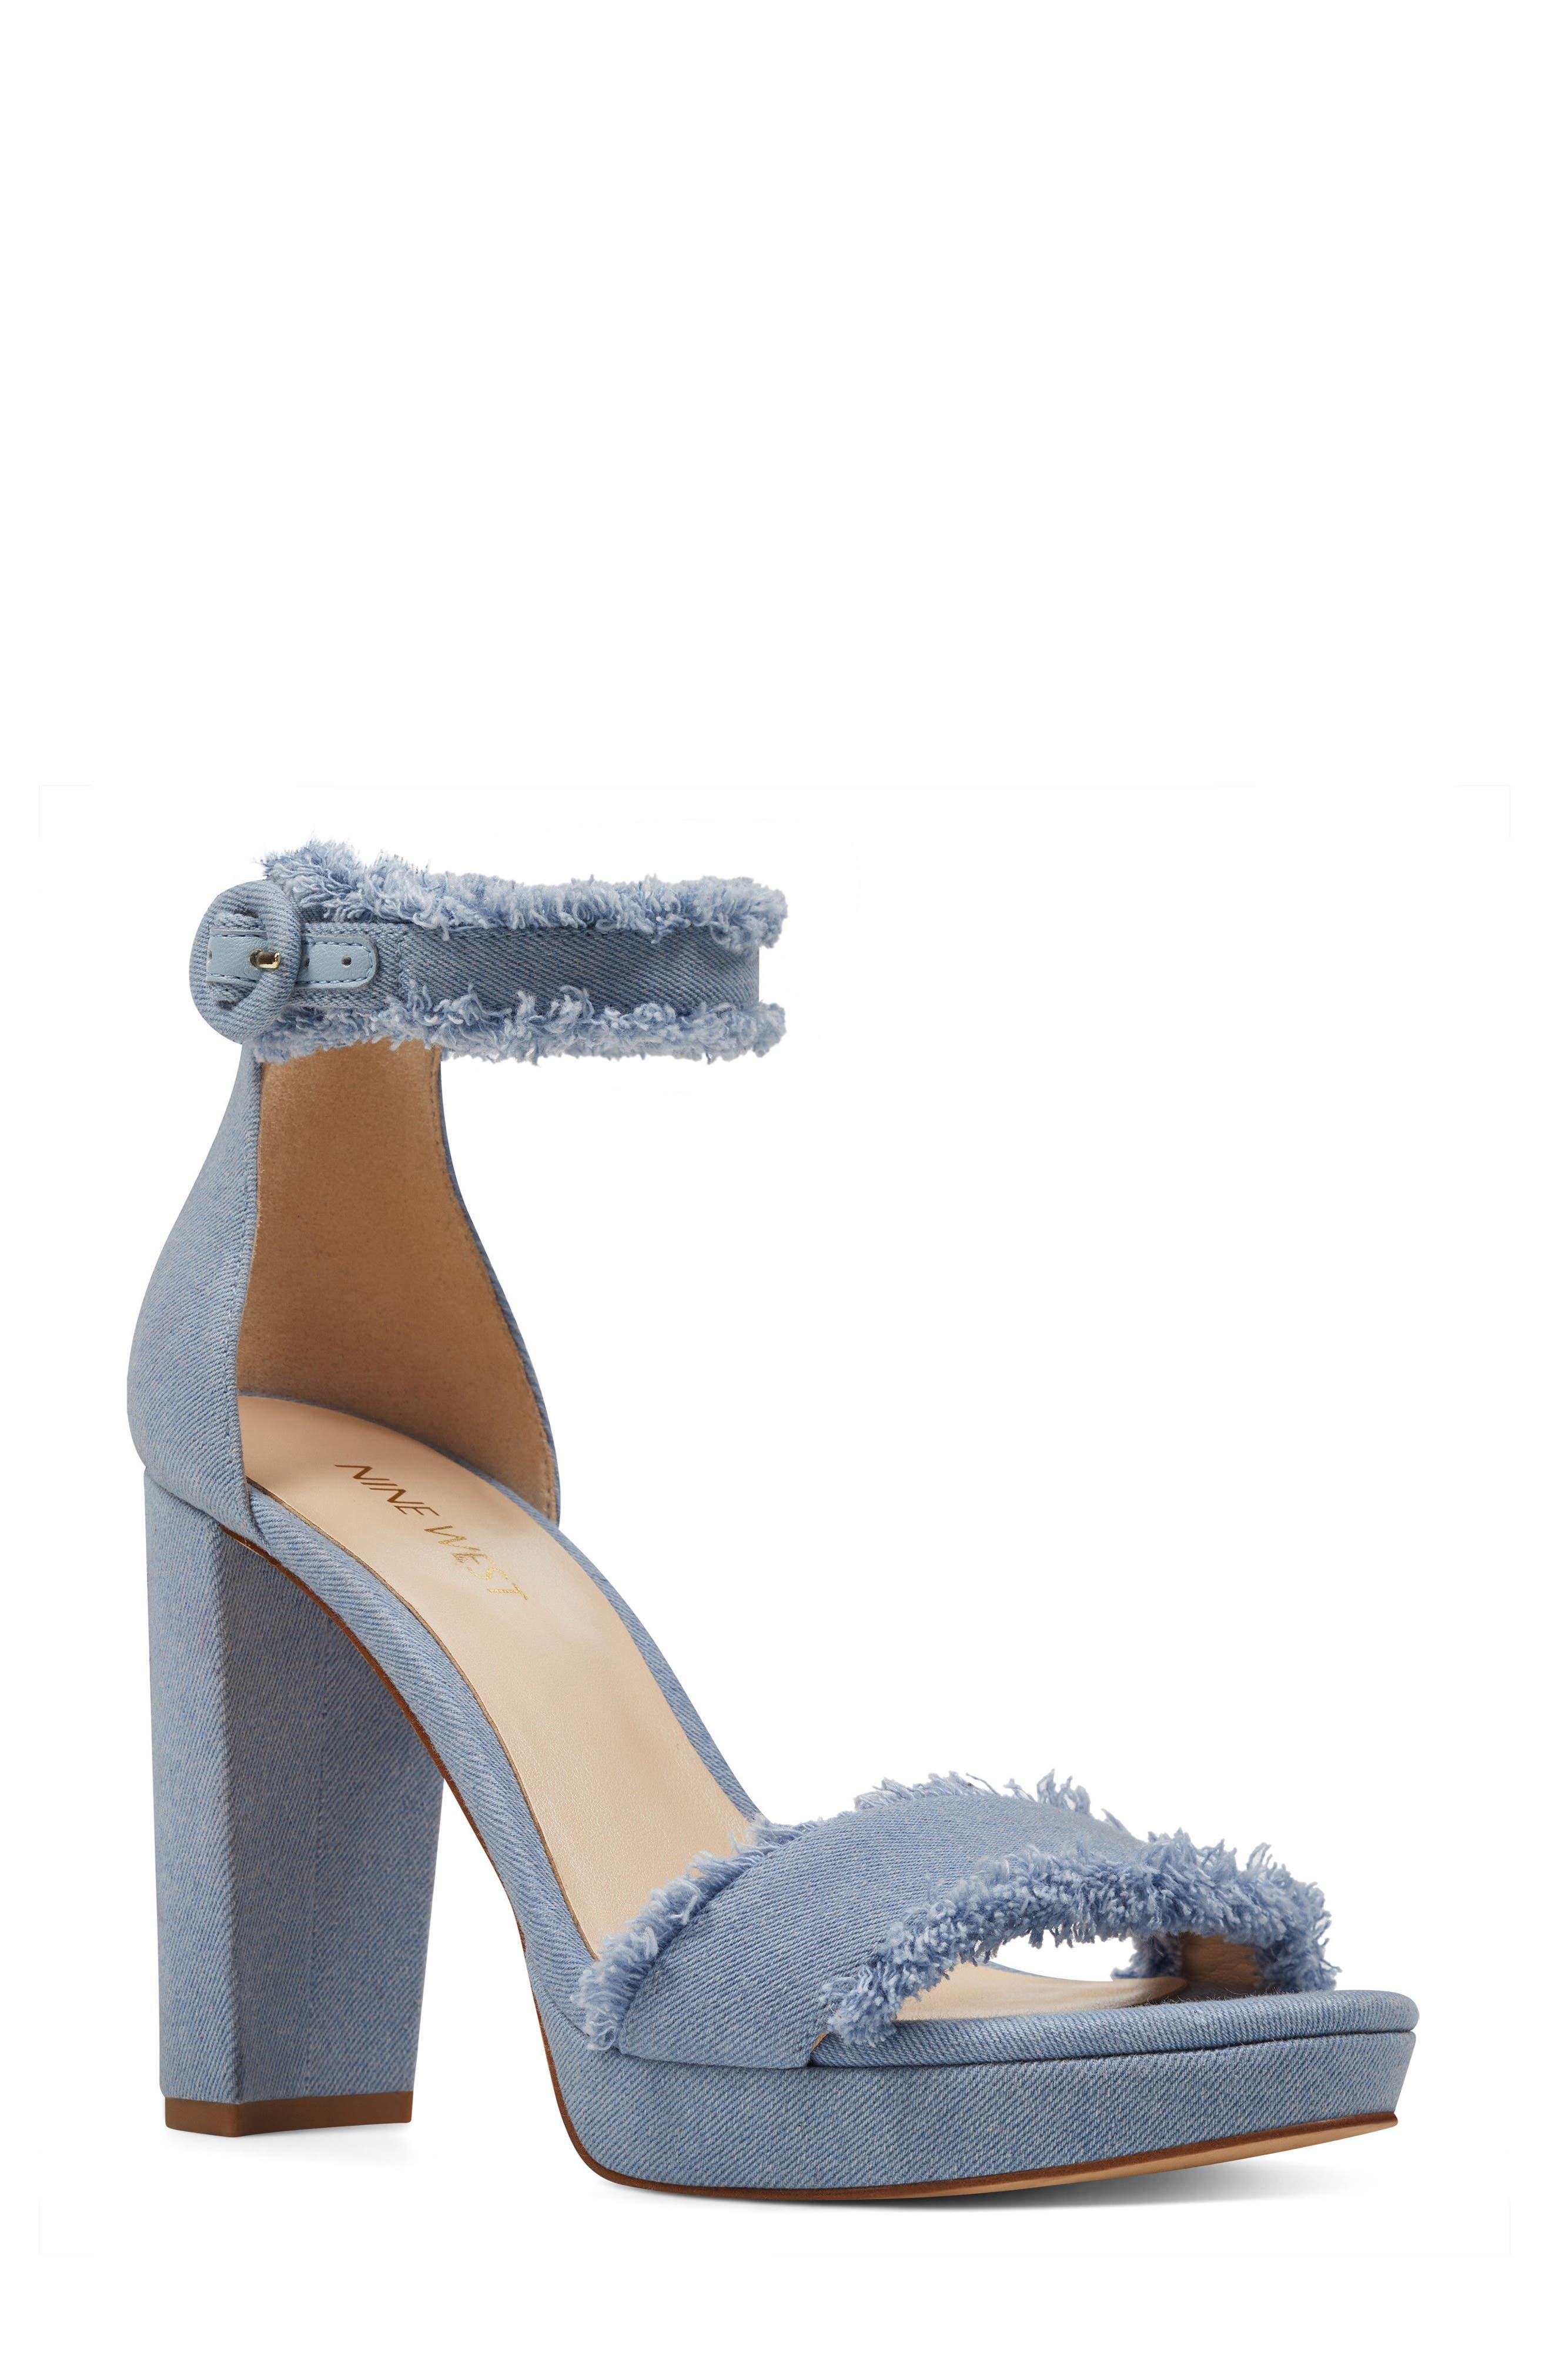 Alternate Image 1 Selected - Nine West Daranita Ankle Strap Sandal (Women)